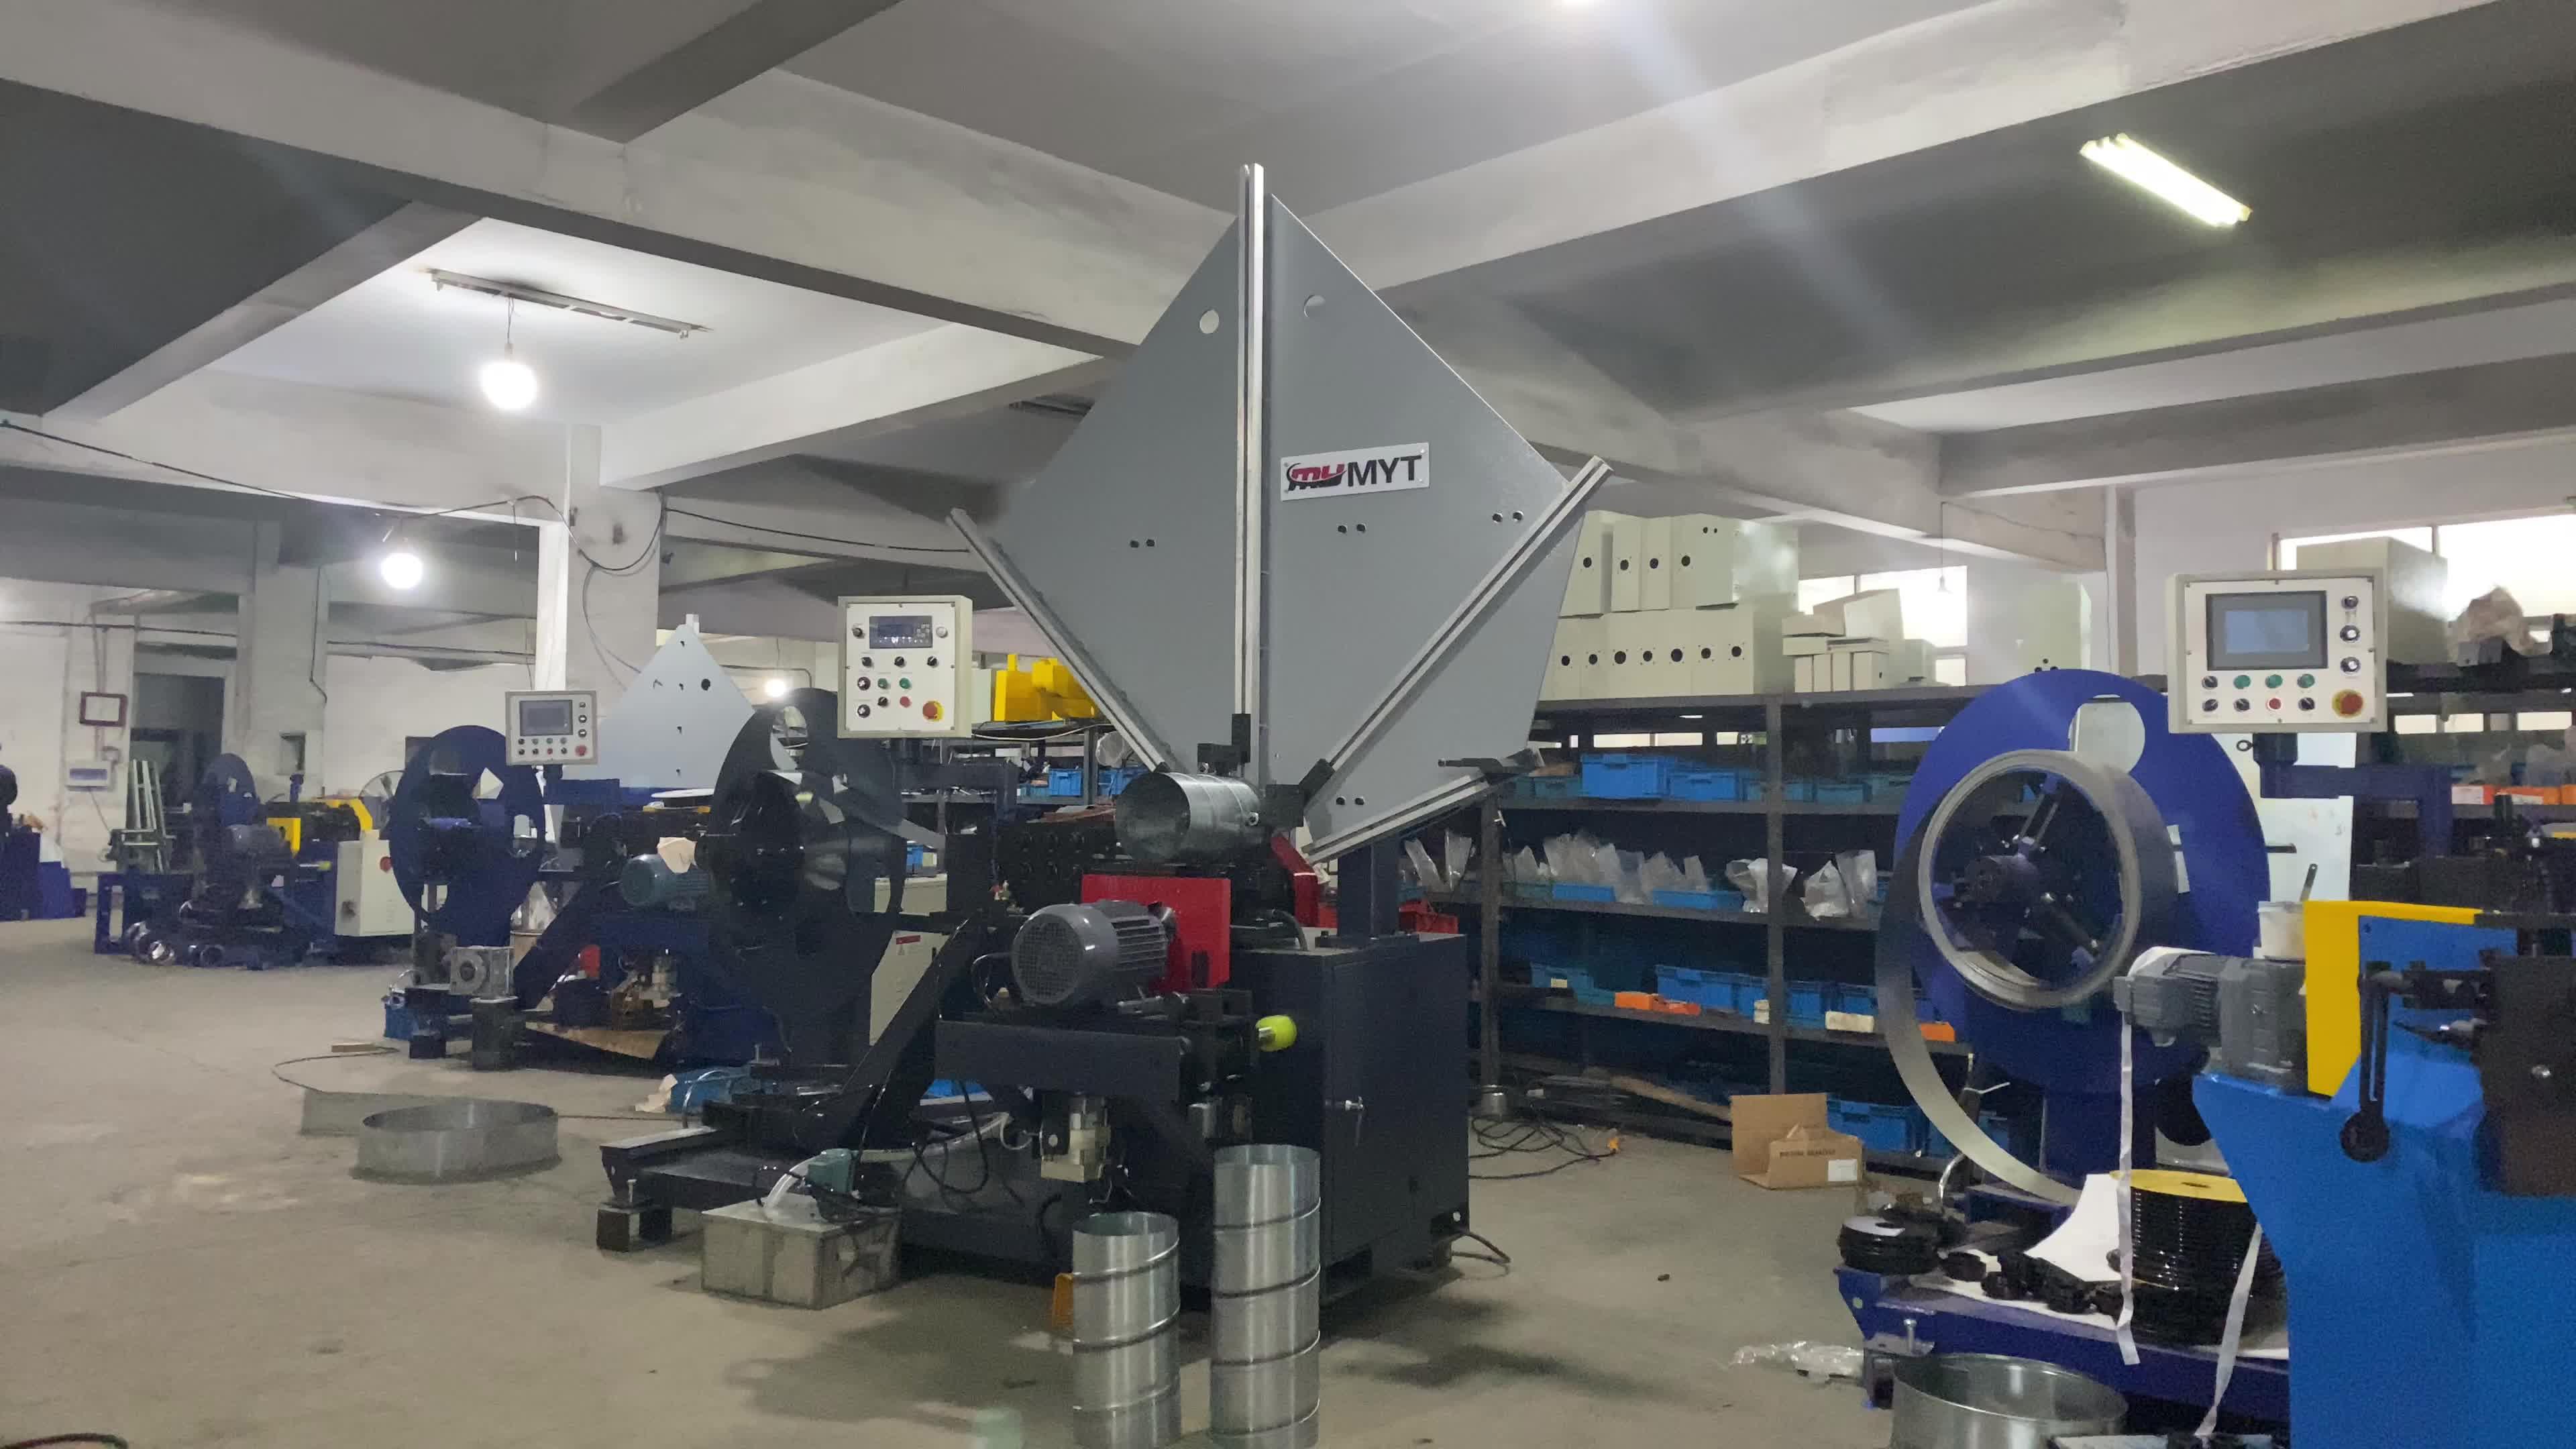 MYT 브랜드 MYTF-1500 HVAC 라운드 파이프 기계 나선형 덕트 제조 기계